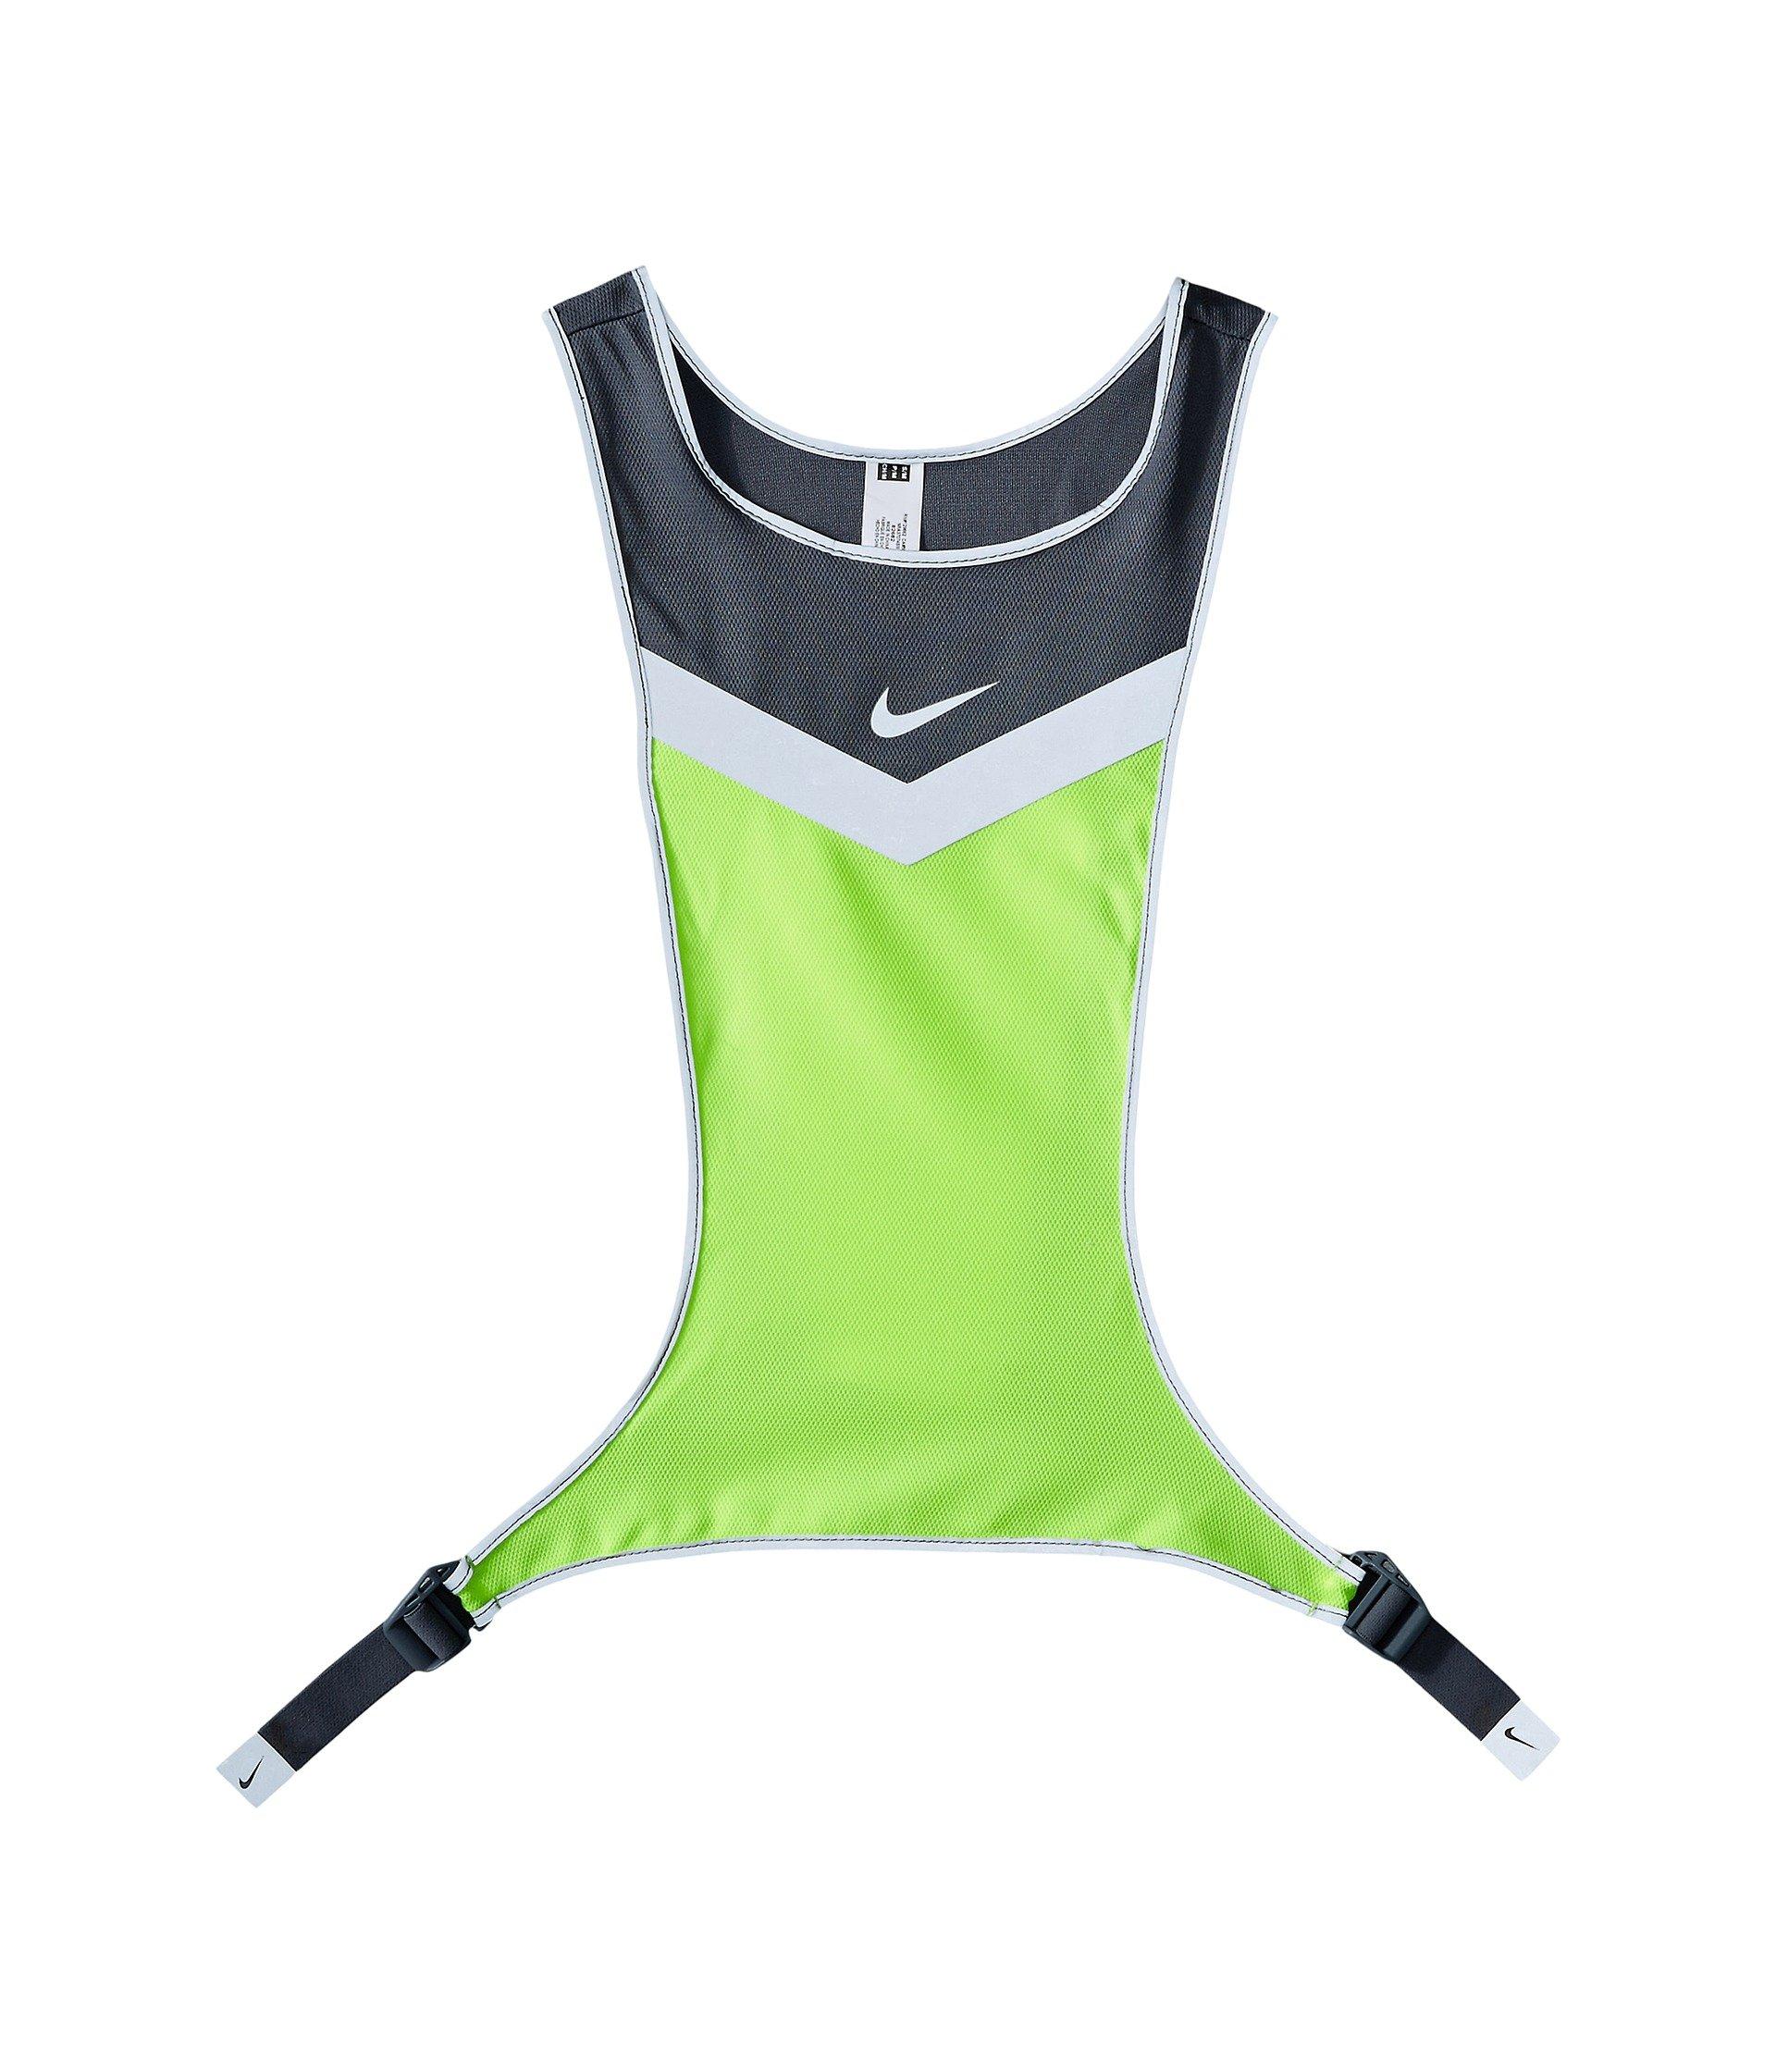 Nike Vividstrike Run Vest, Cool Grey/Volt/Silver, SM/MD by Nike